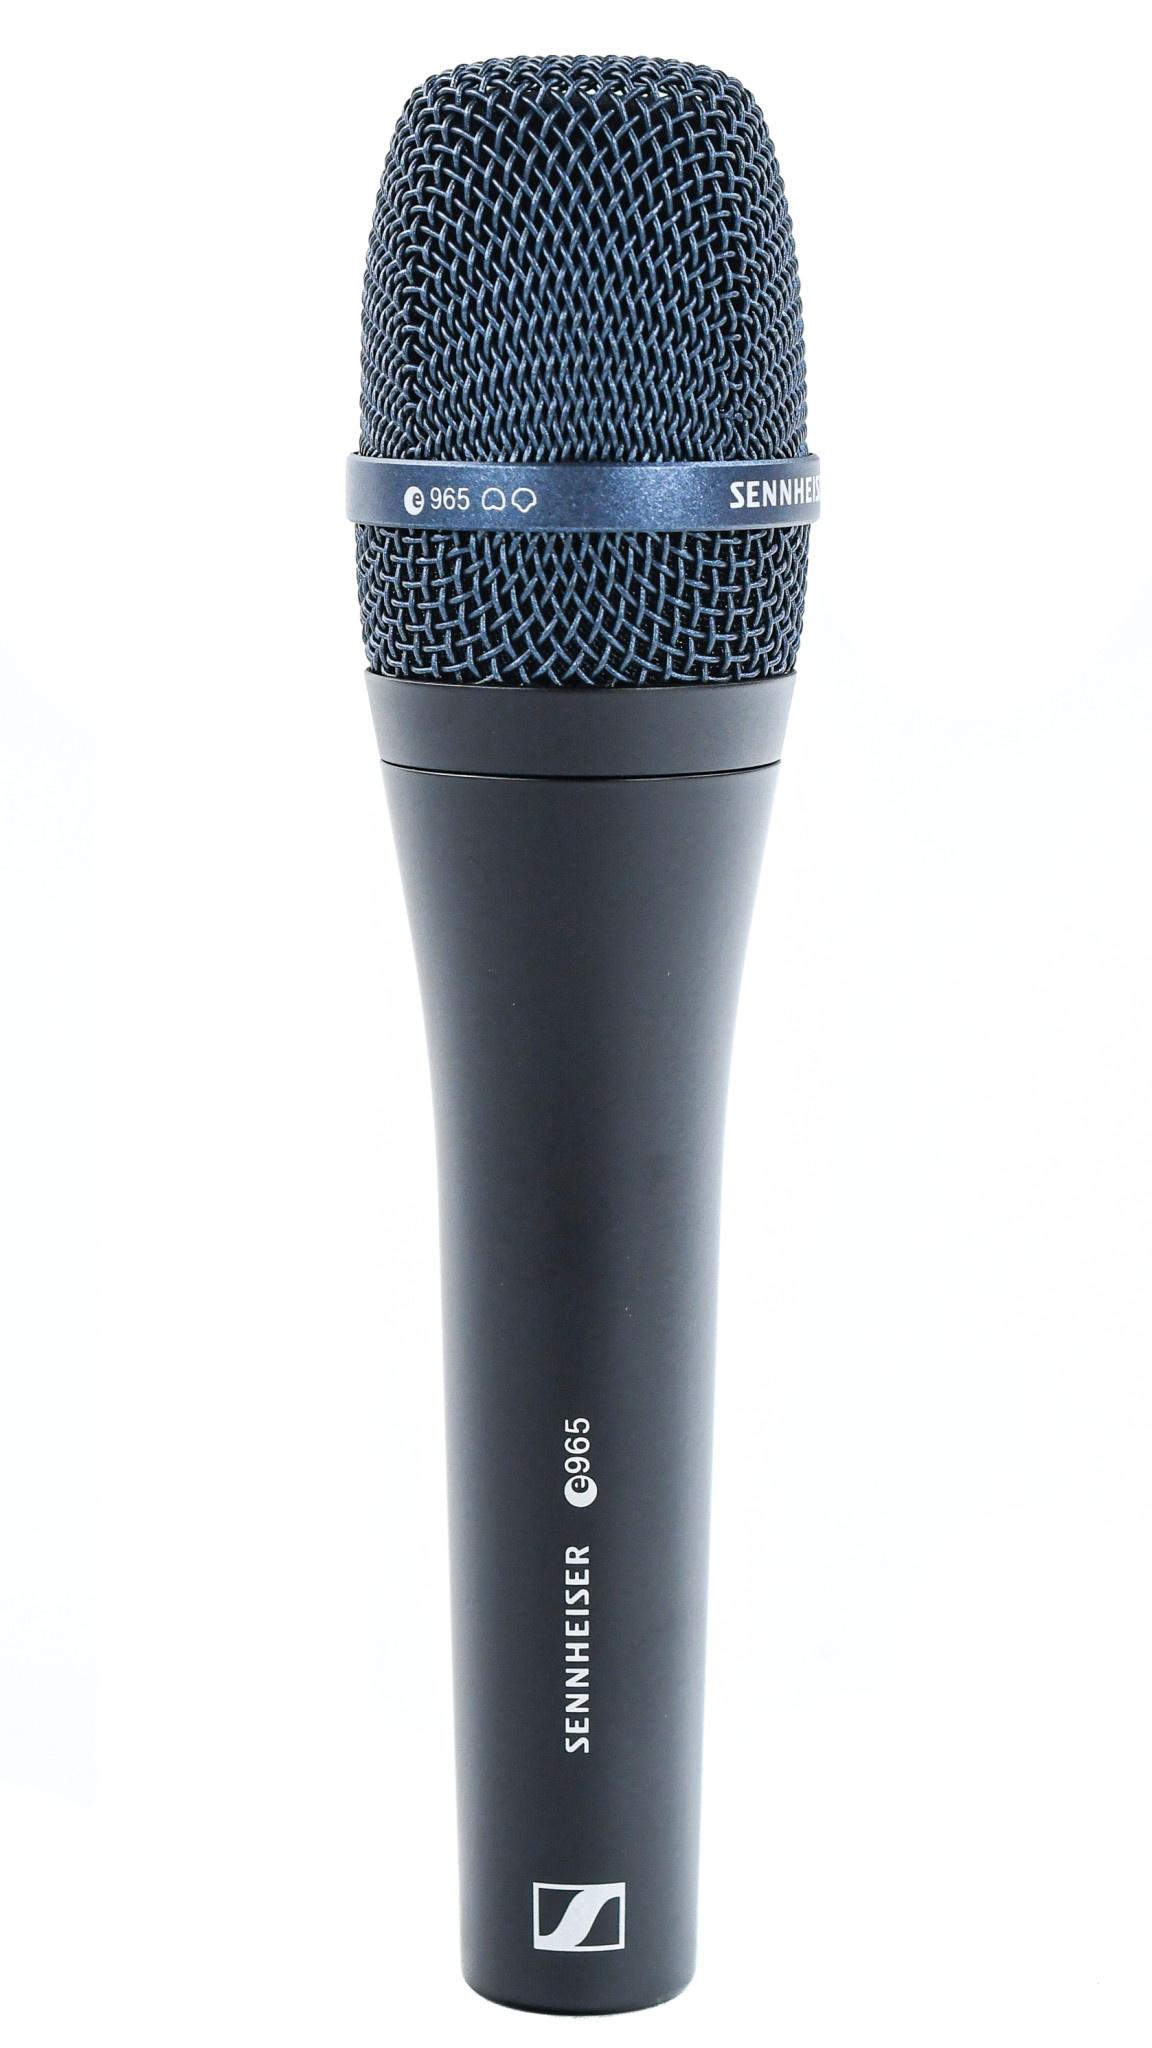 Sennheiser E965 Condensator Vocal Microphone